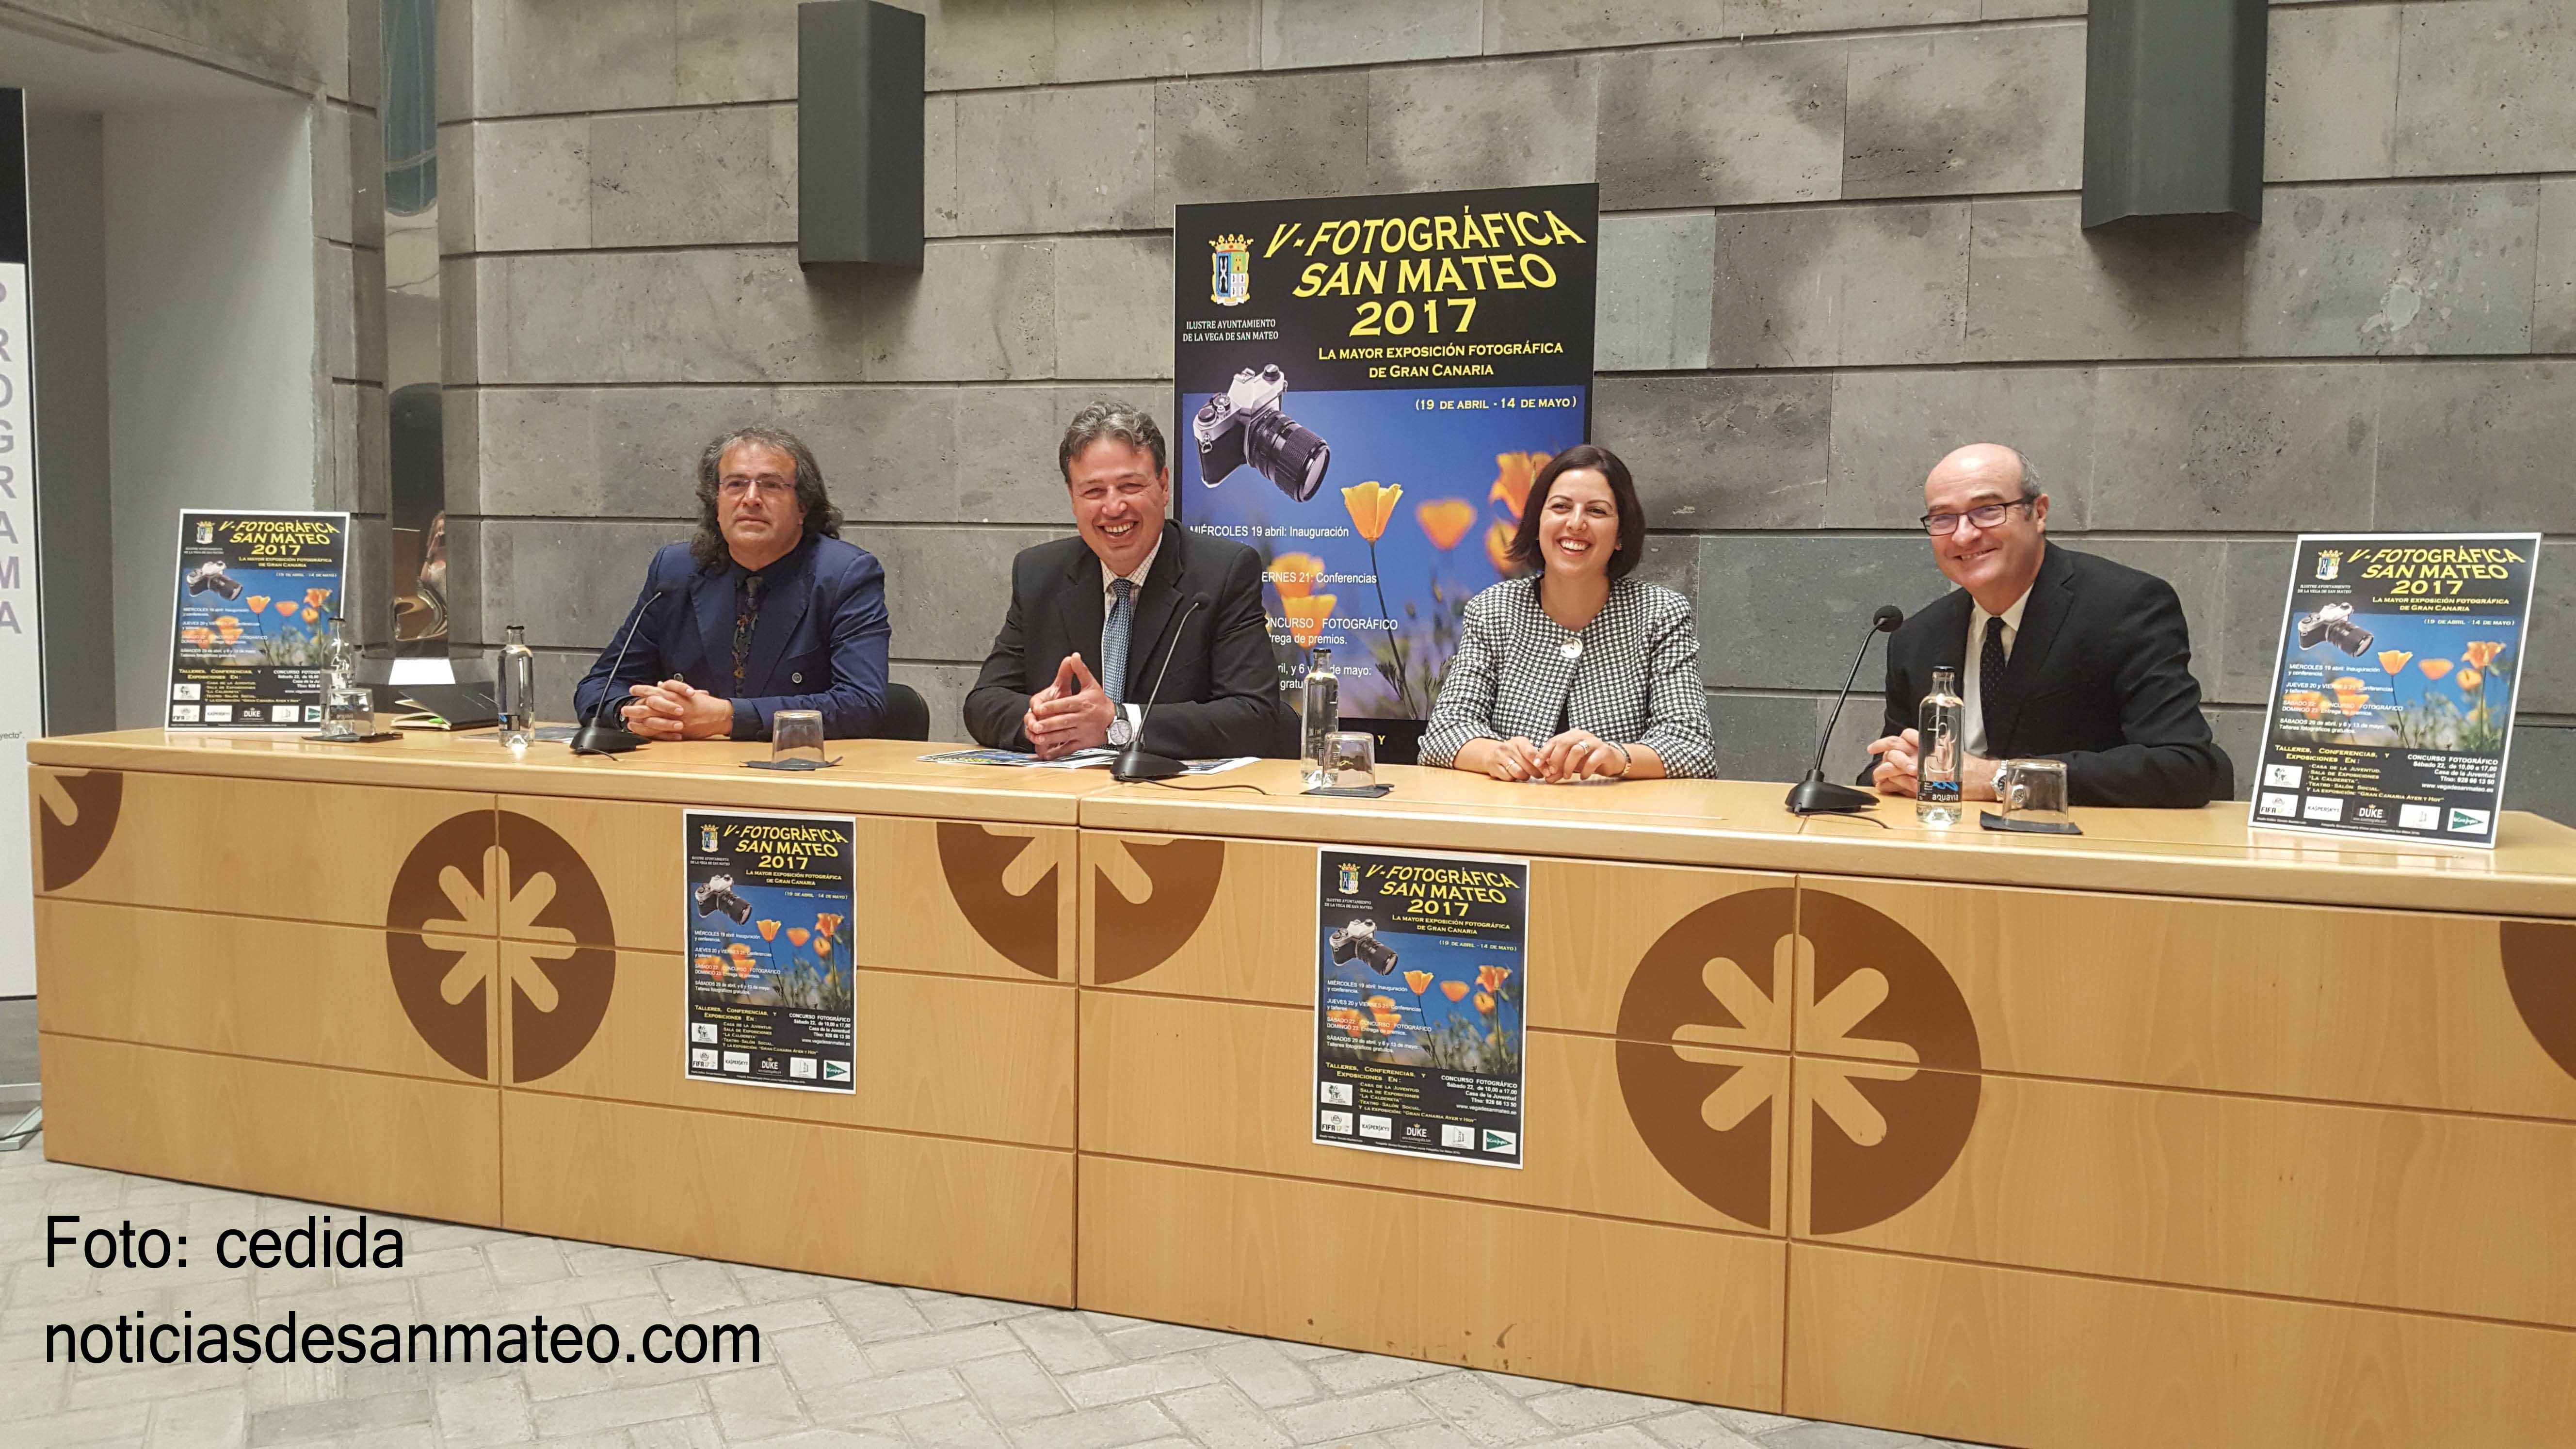 Presentacion Fotografica San Mateo 2017 17 abril